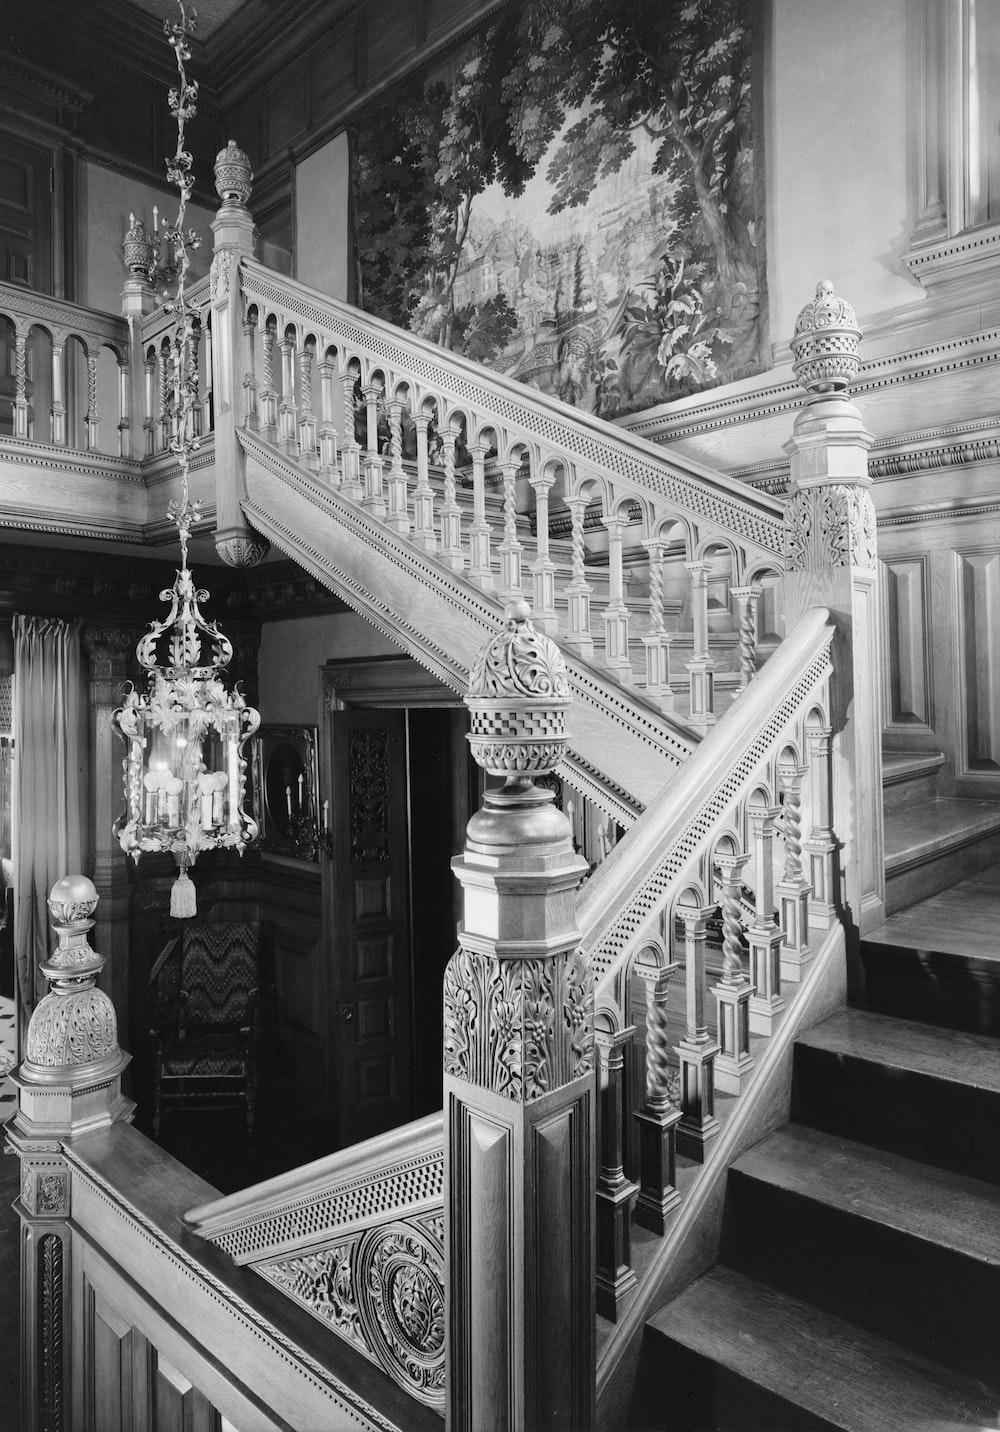 James C. Burbank House -- Stairhall